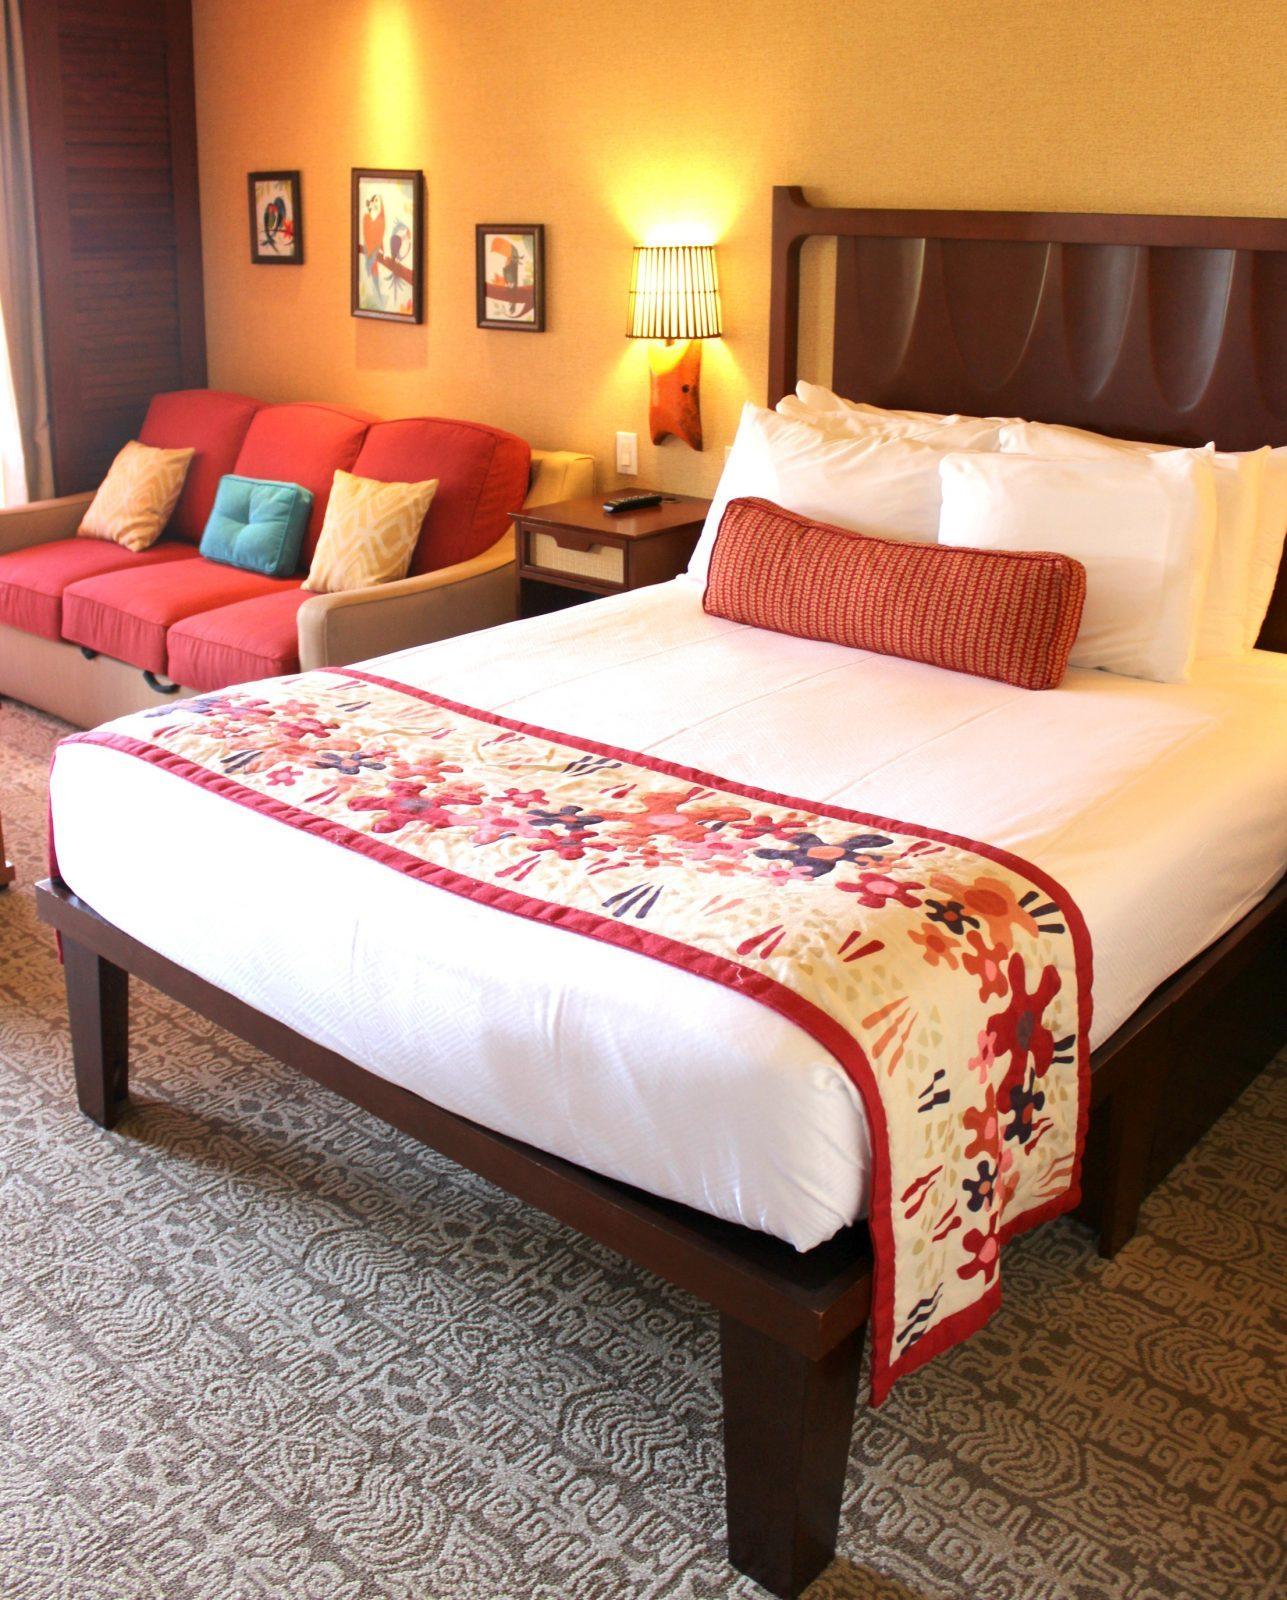 disney resort room at the Polynesian